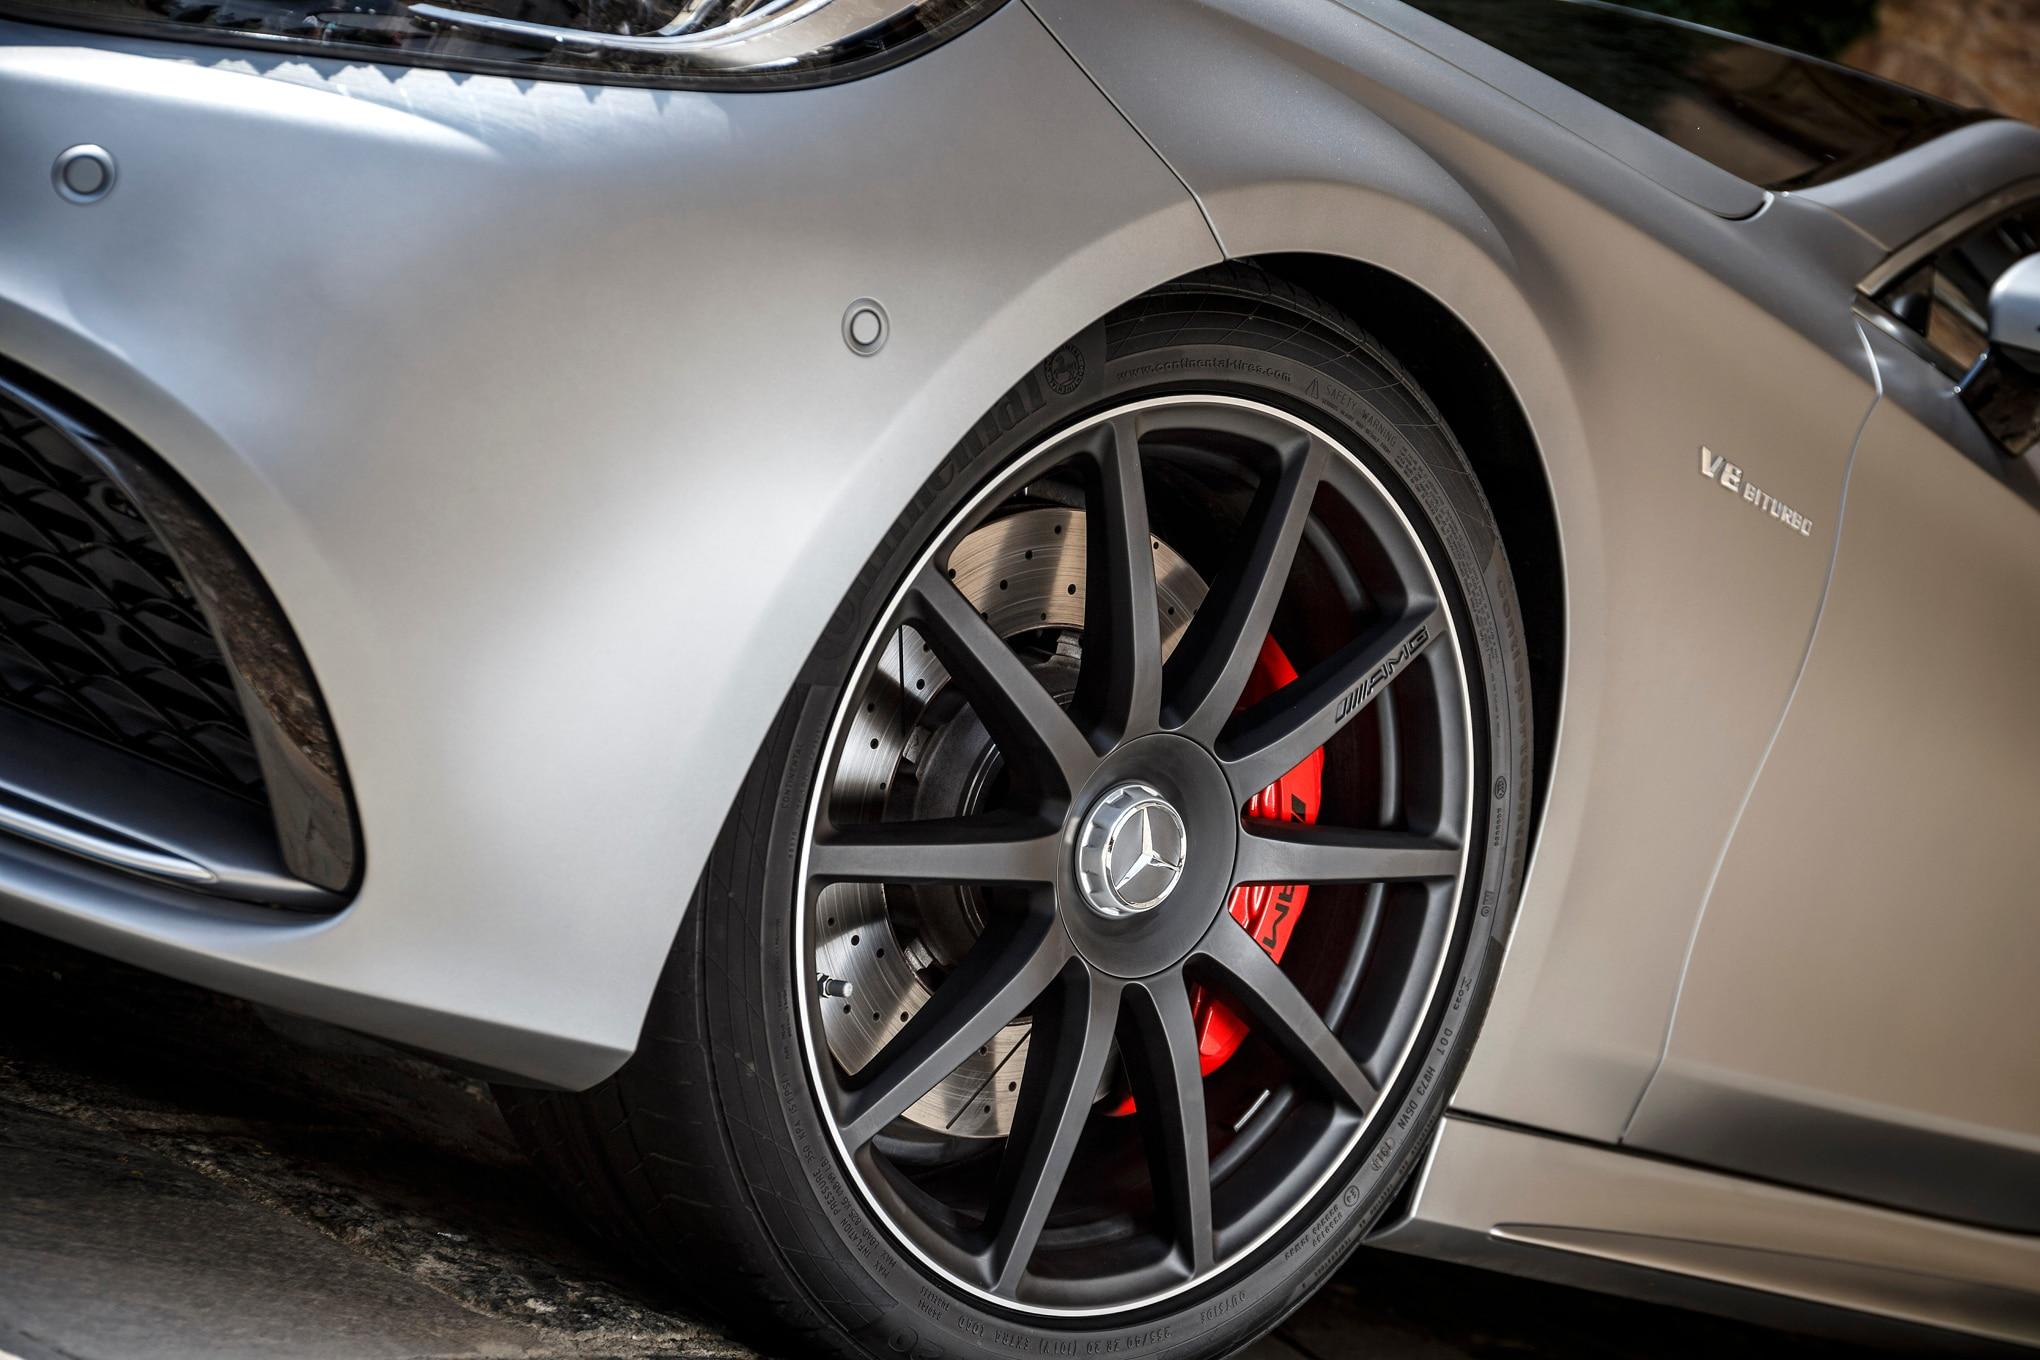 2015 MercedesBenz SClass Coupe Review